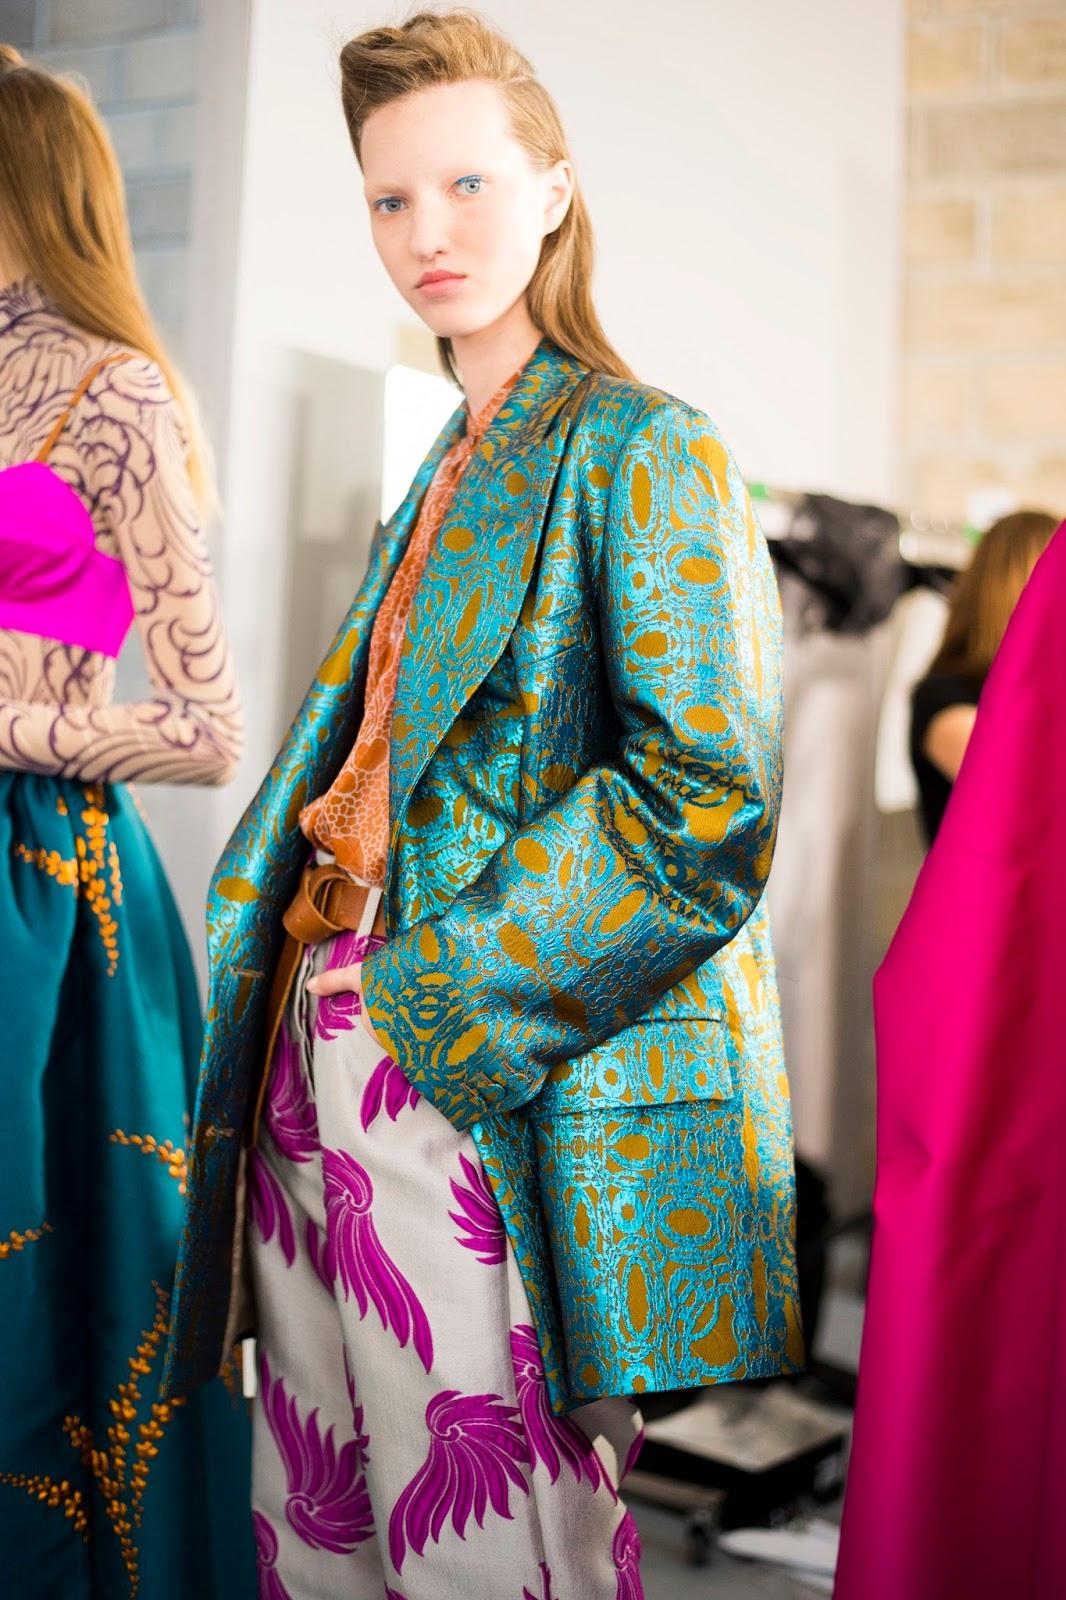 fashion runway dries van noten spring summer 2016 paris fashion week cool chic style fashion. Black Bedroom Furniture Sets. Home Design Ideas